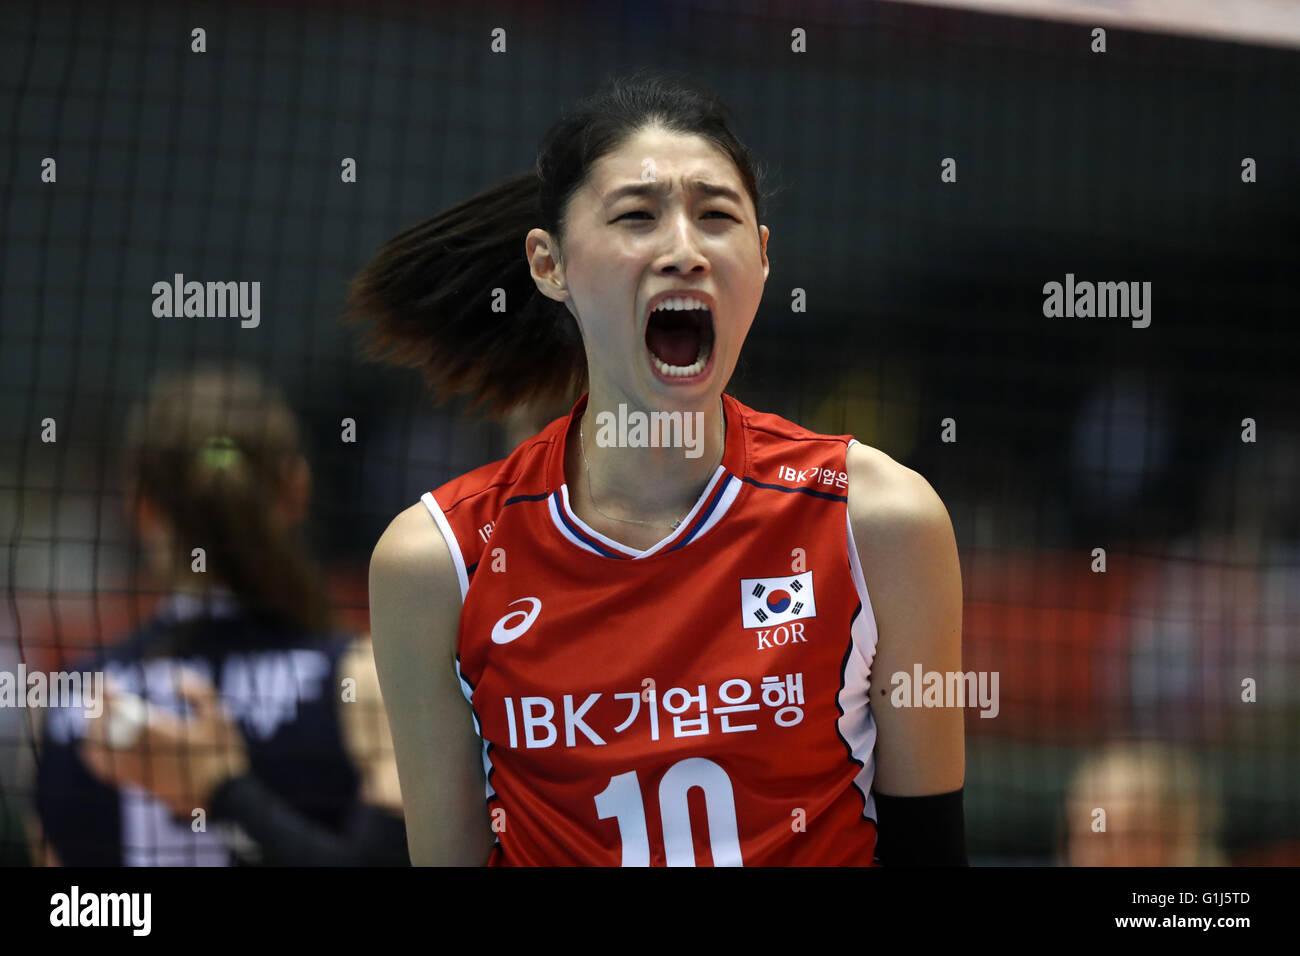 http://c8.alamy.com/comp/G1J5TD/tokyo-metropolitan-gymnasium-tokyo-japan-15th-may-2016-kim-yeon-koung-G1J5TD.jpg